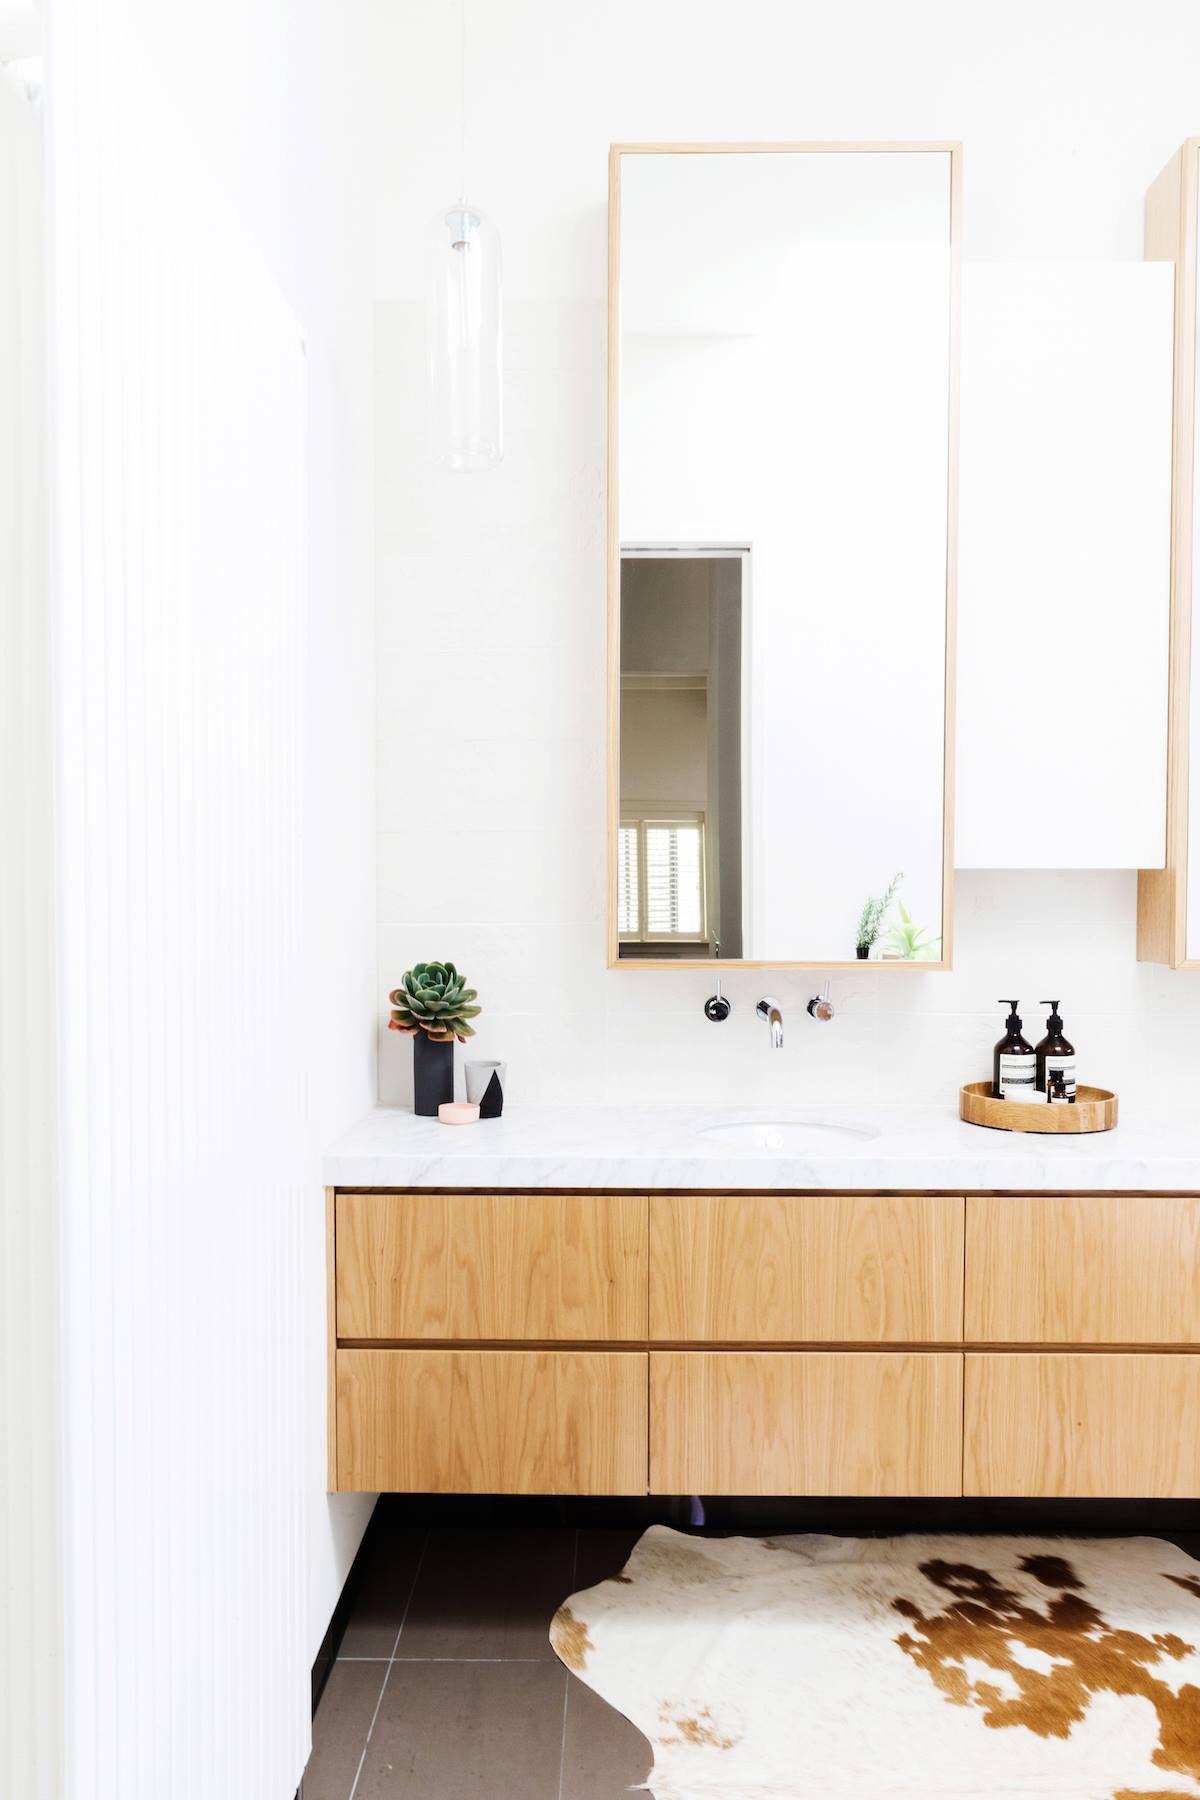 Simple   BATHROOM   Pinterest   Baths interior, Interiors and Bath